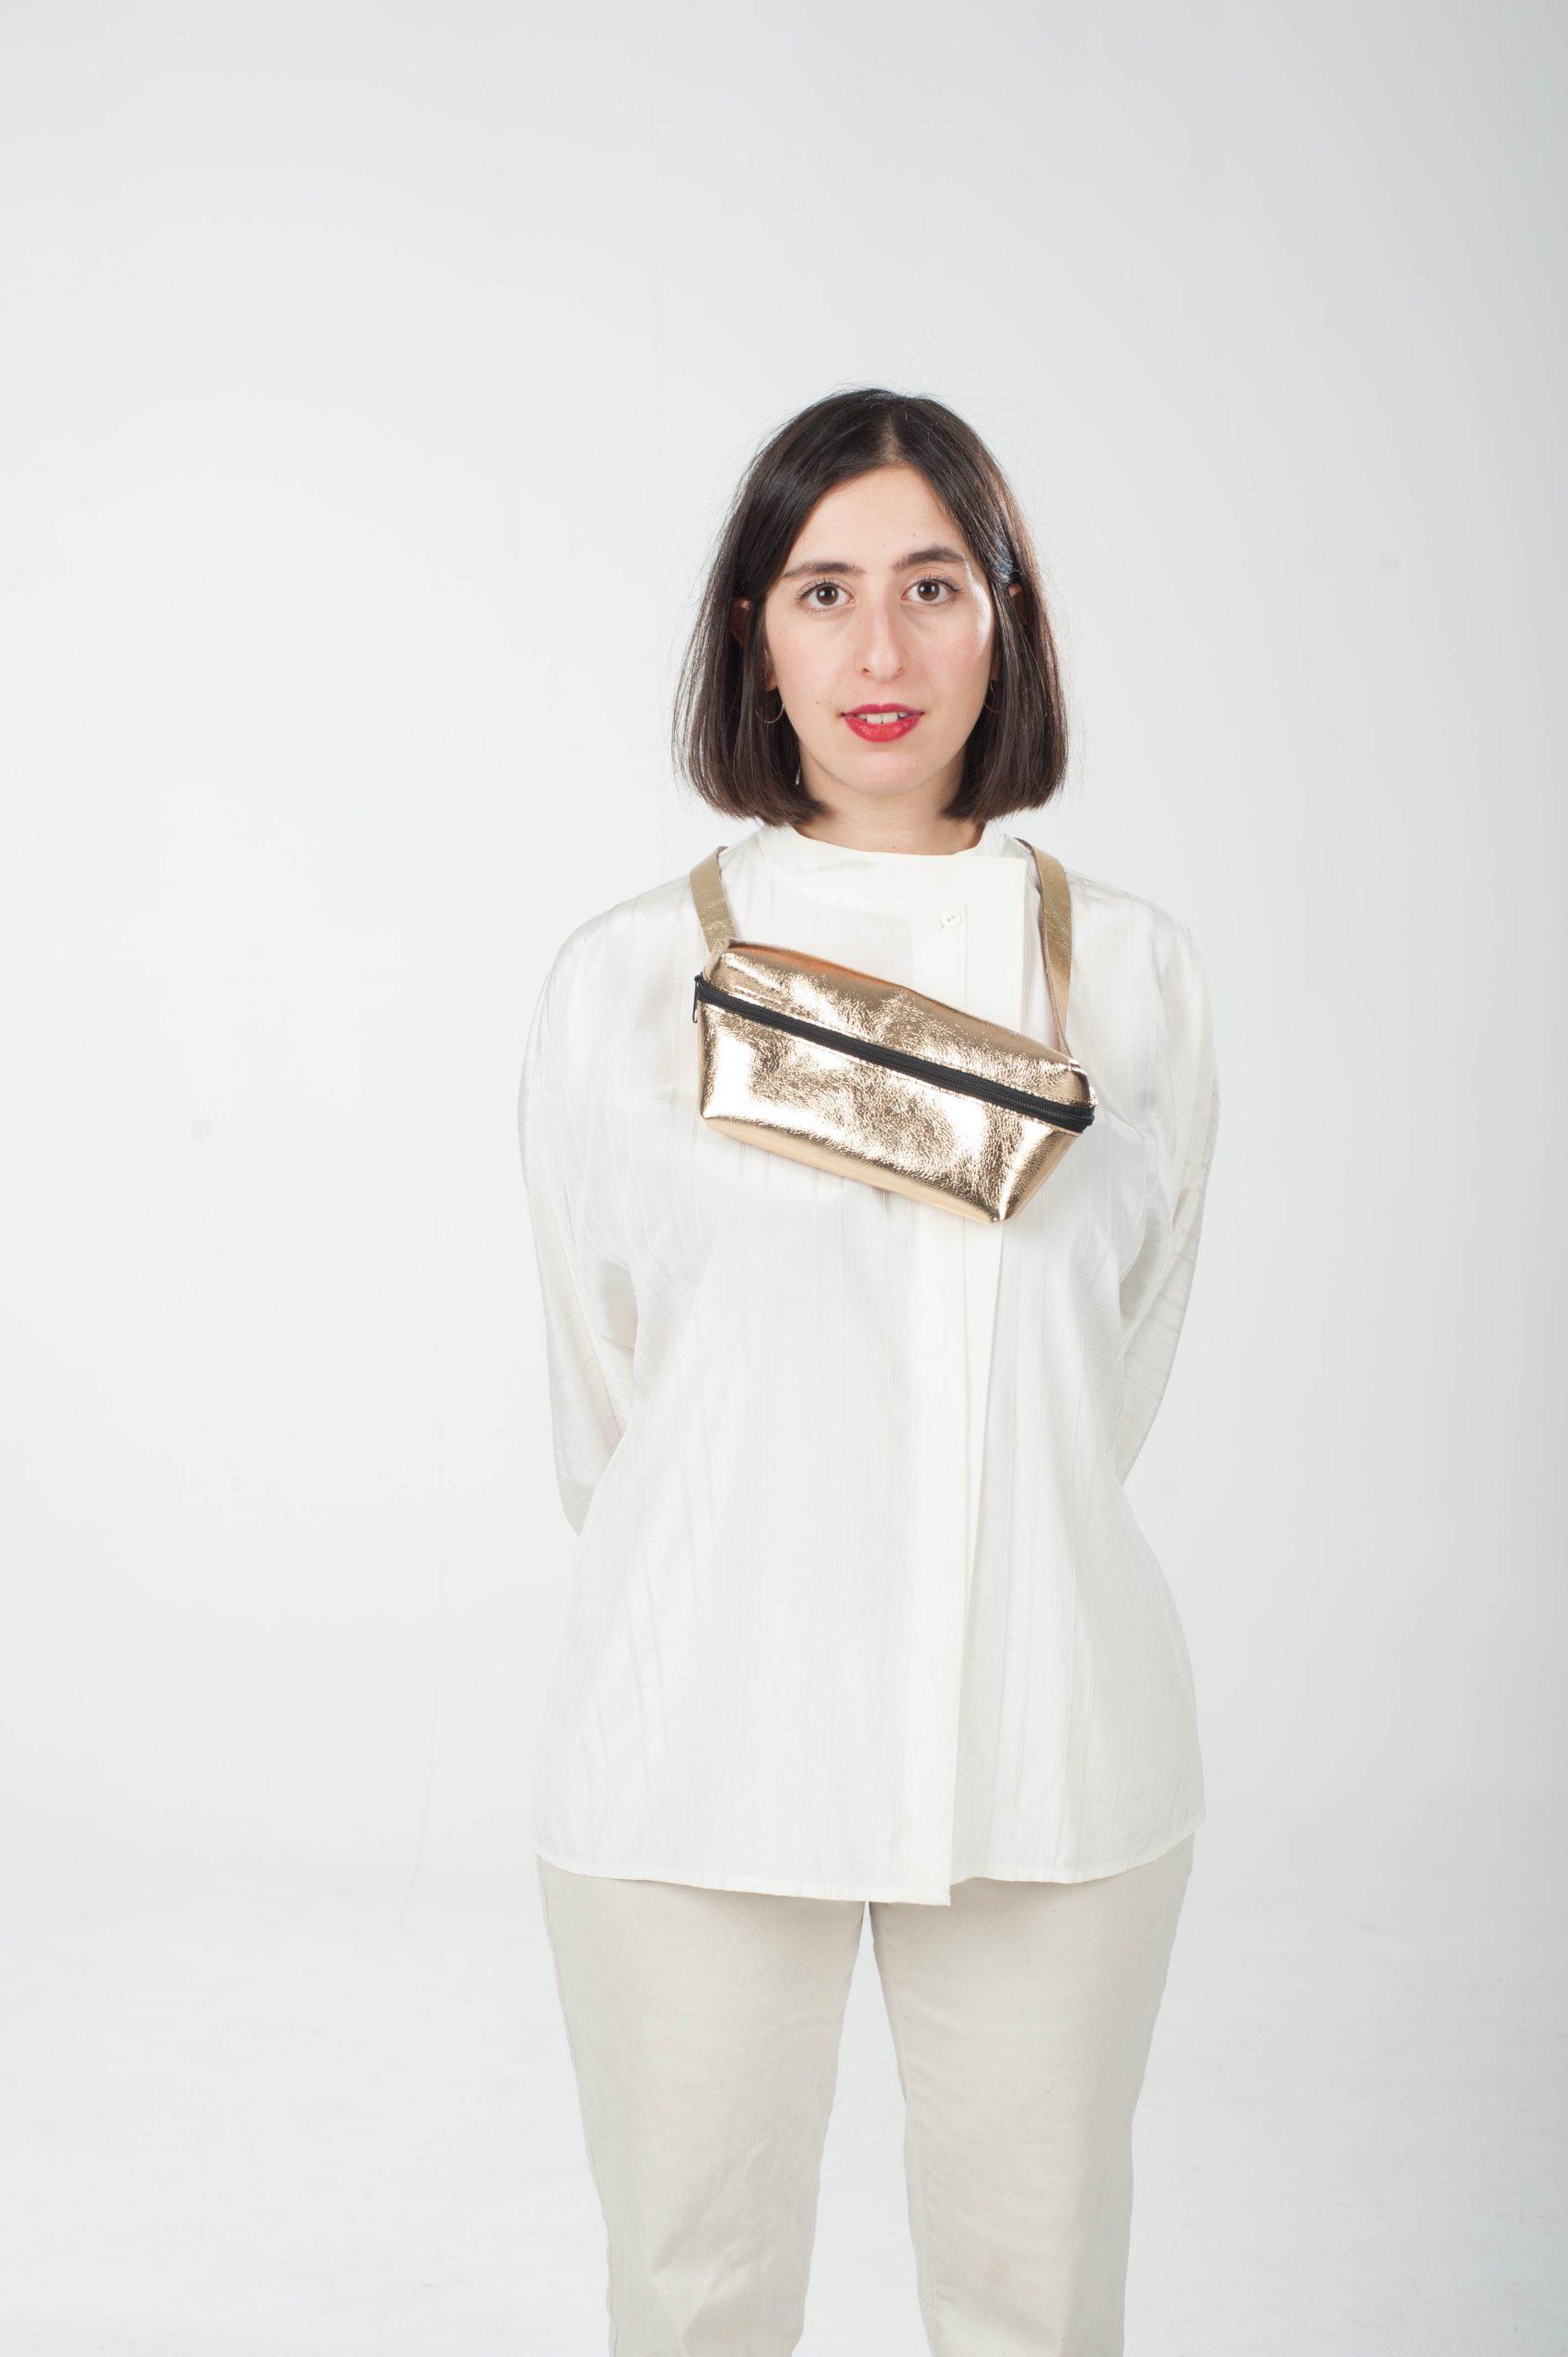 Model mit goldener Leder-Bauchtasche